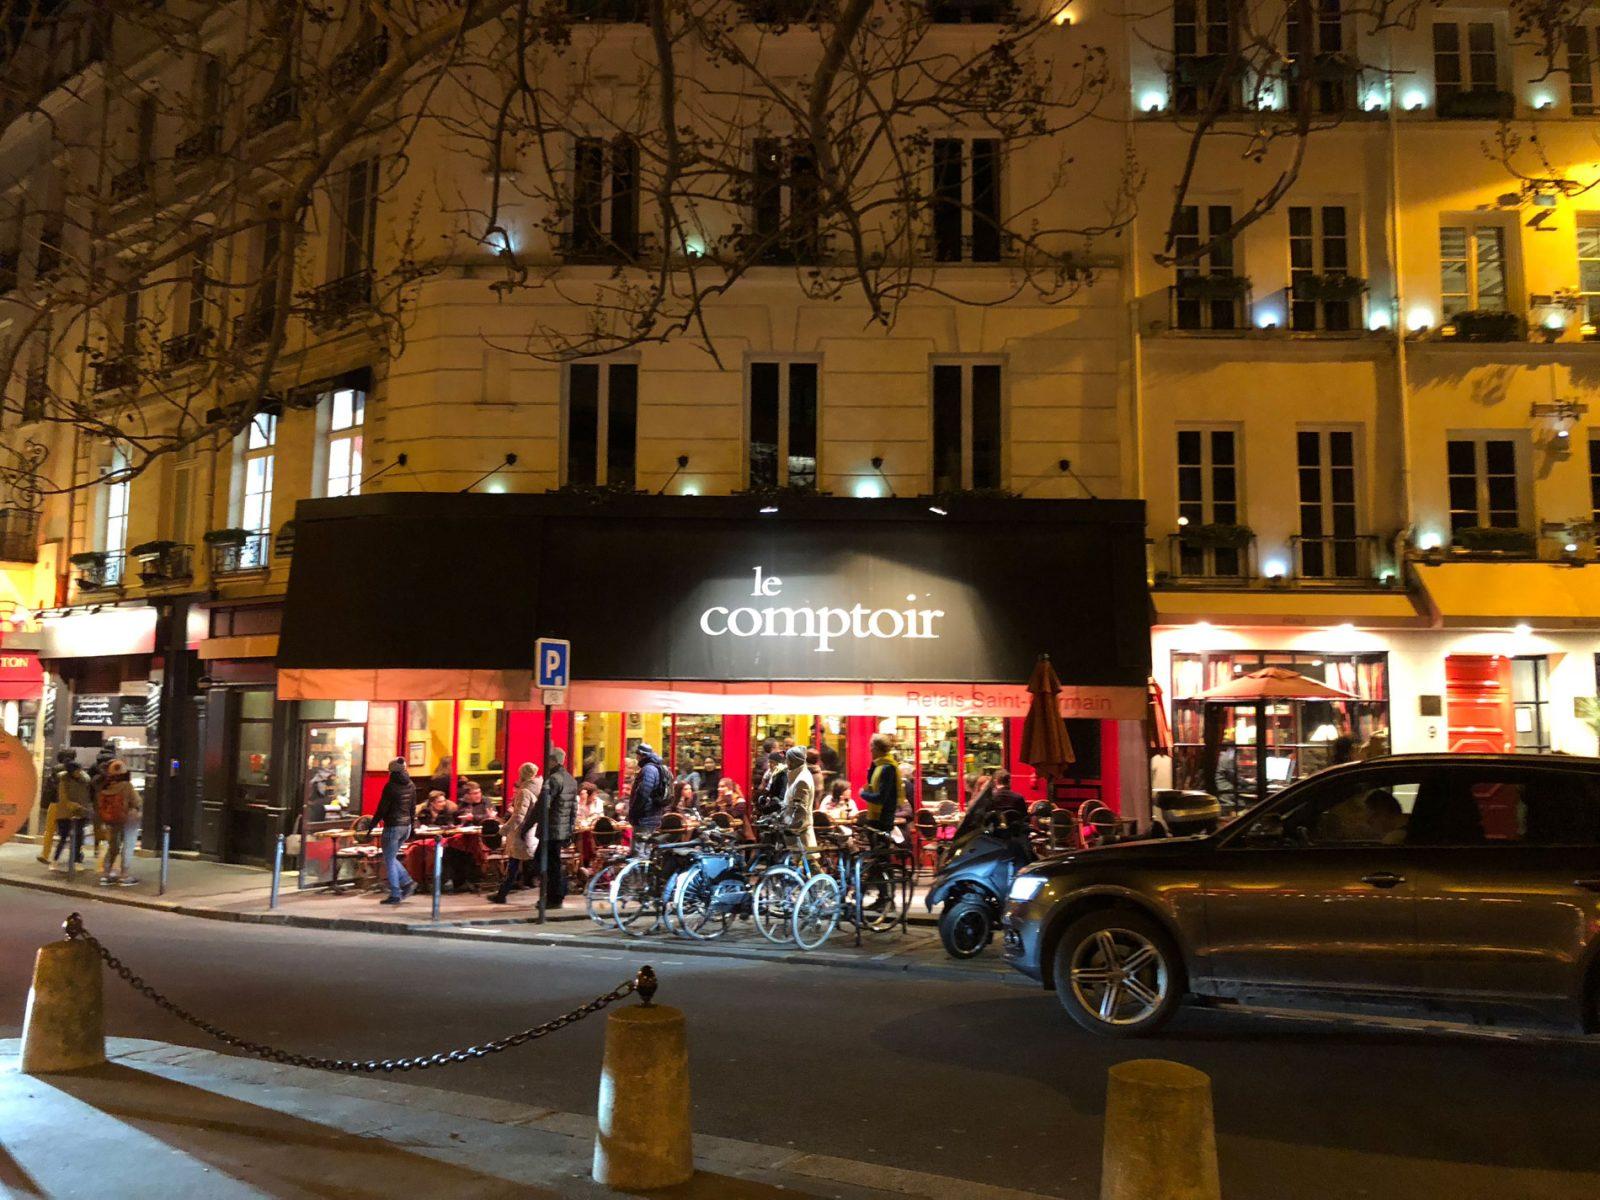 Le Comptoir Bistrot & Restaurant